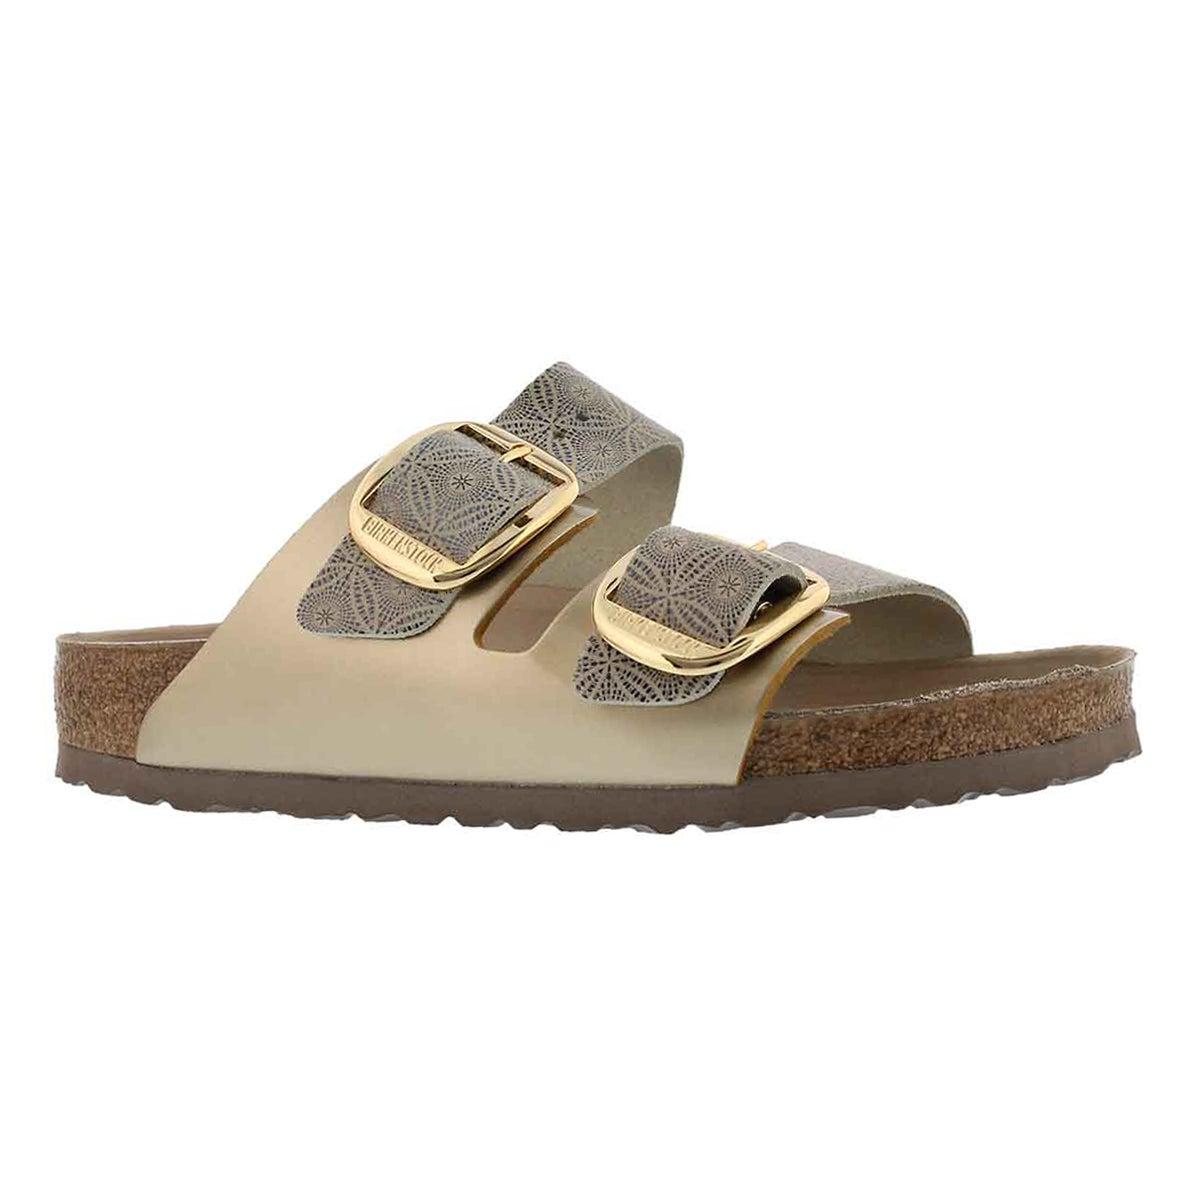 Women's ARIZONA BIG BUCKLE LTR sandals - Narrow